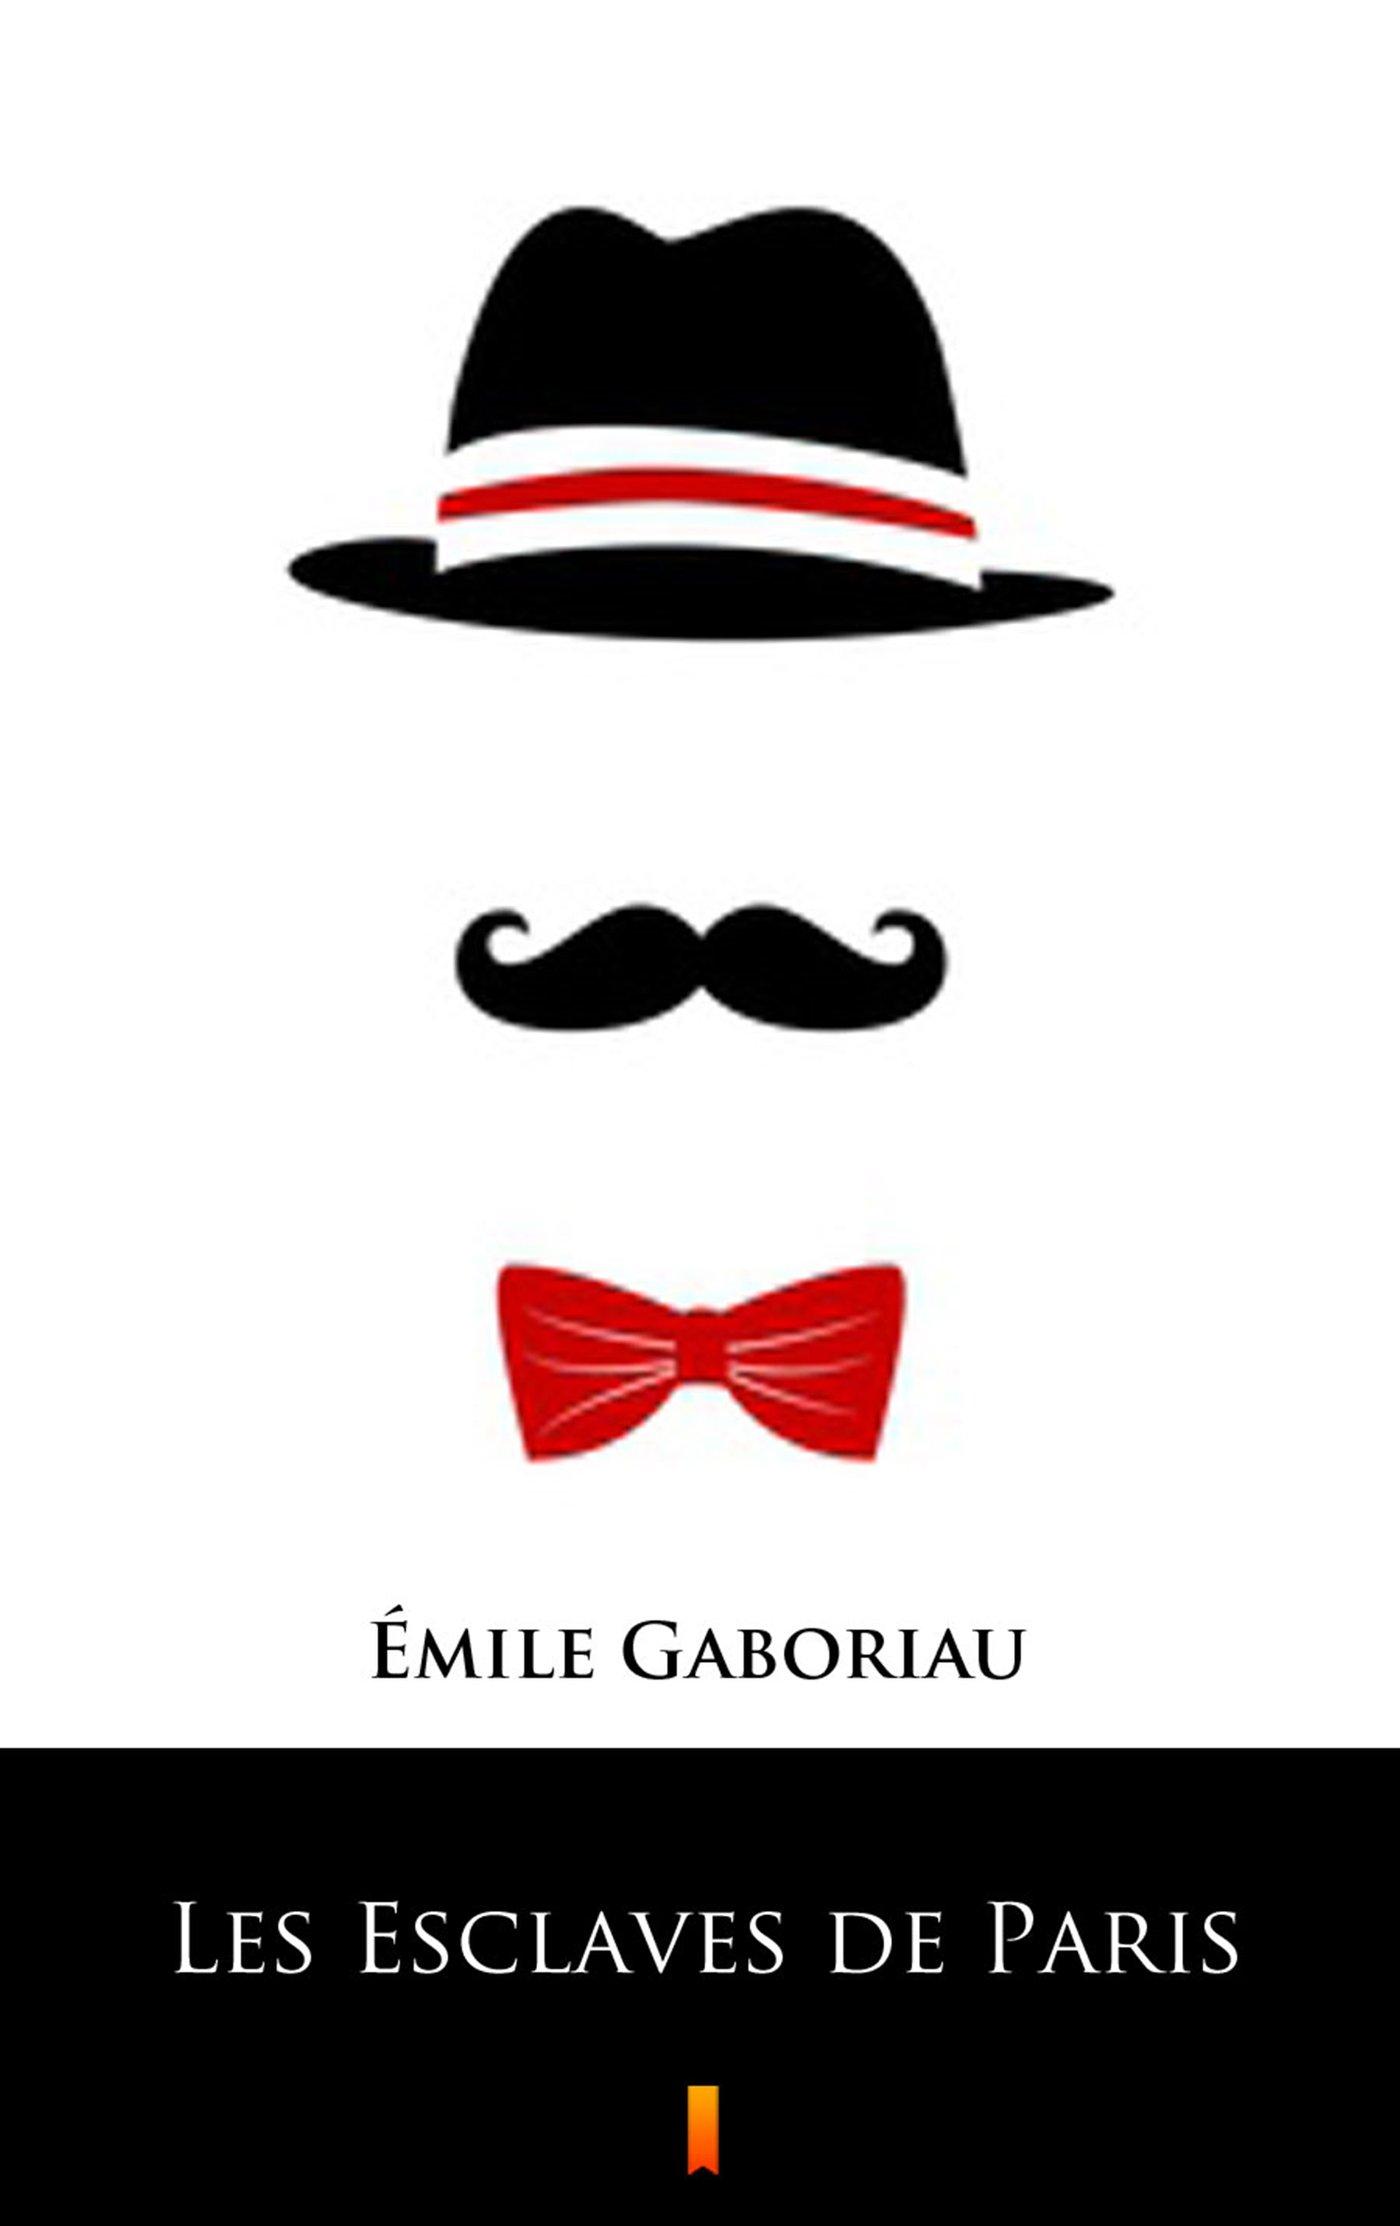 Les Esclaves de Paris - Ebook (Książka EPUB) do pobrania w formacie EPUB